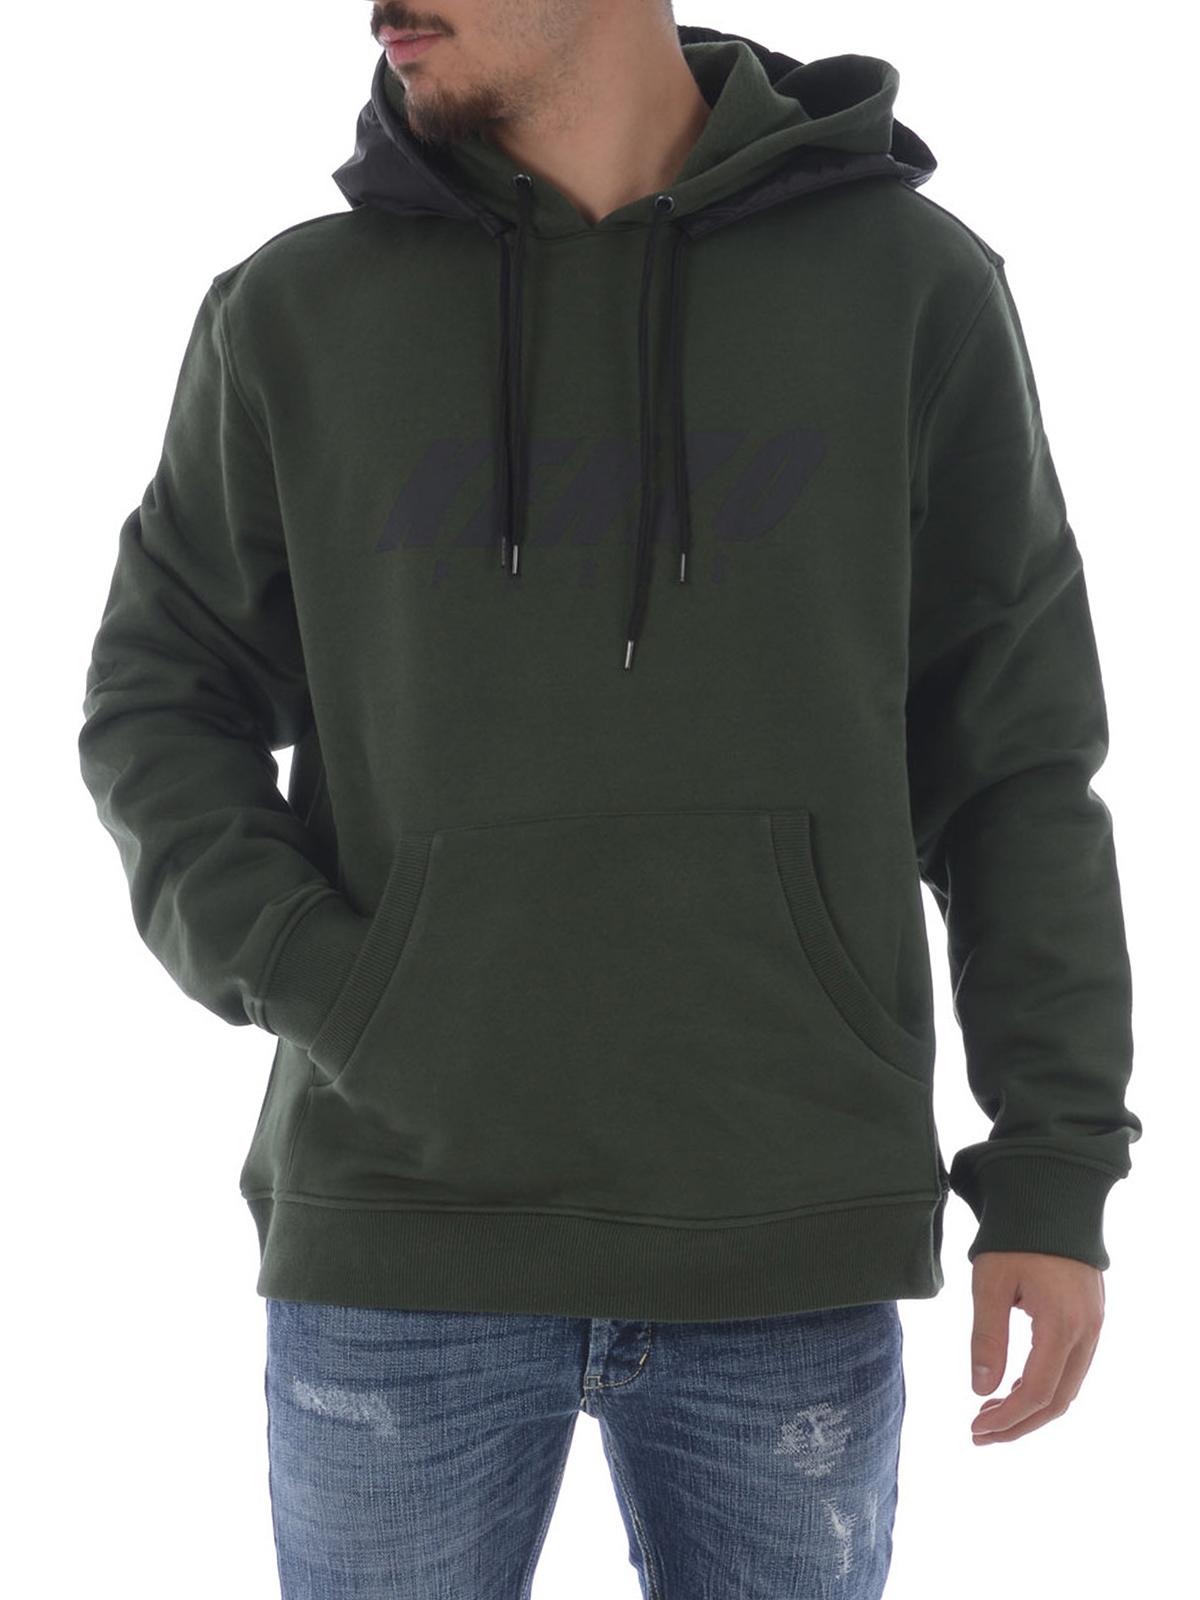 b0d0839e4883a Kenzo - Sudadera - Verde Oscuro - Sudaderas y suéteres - F765SW4044ME51